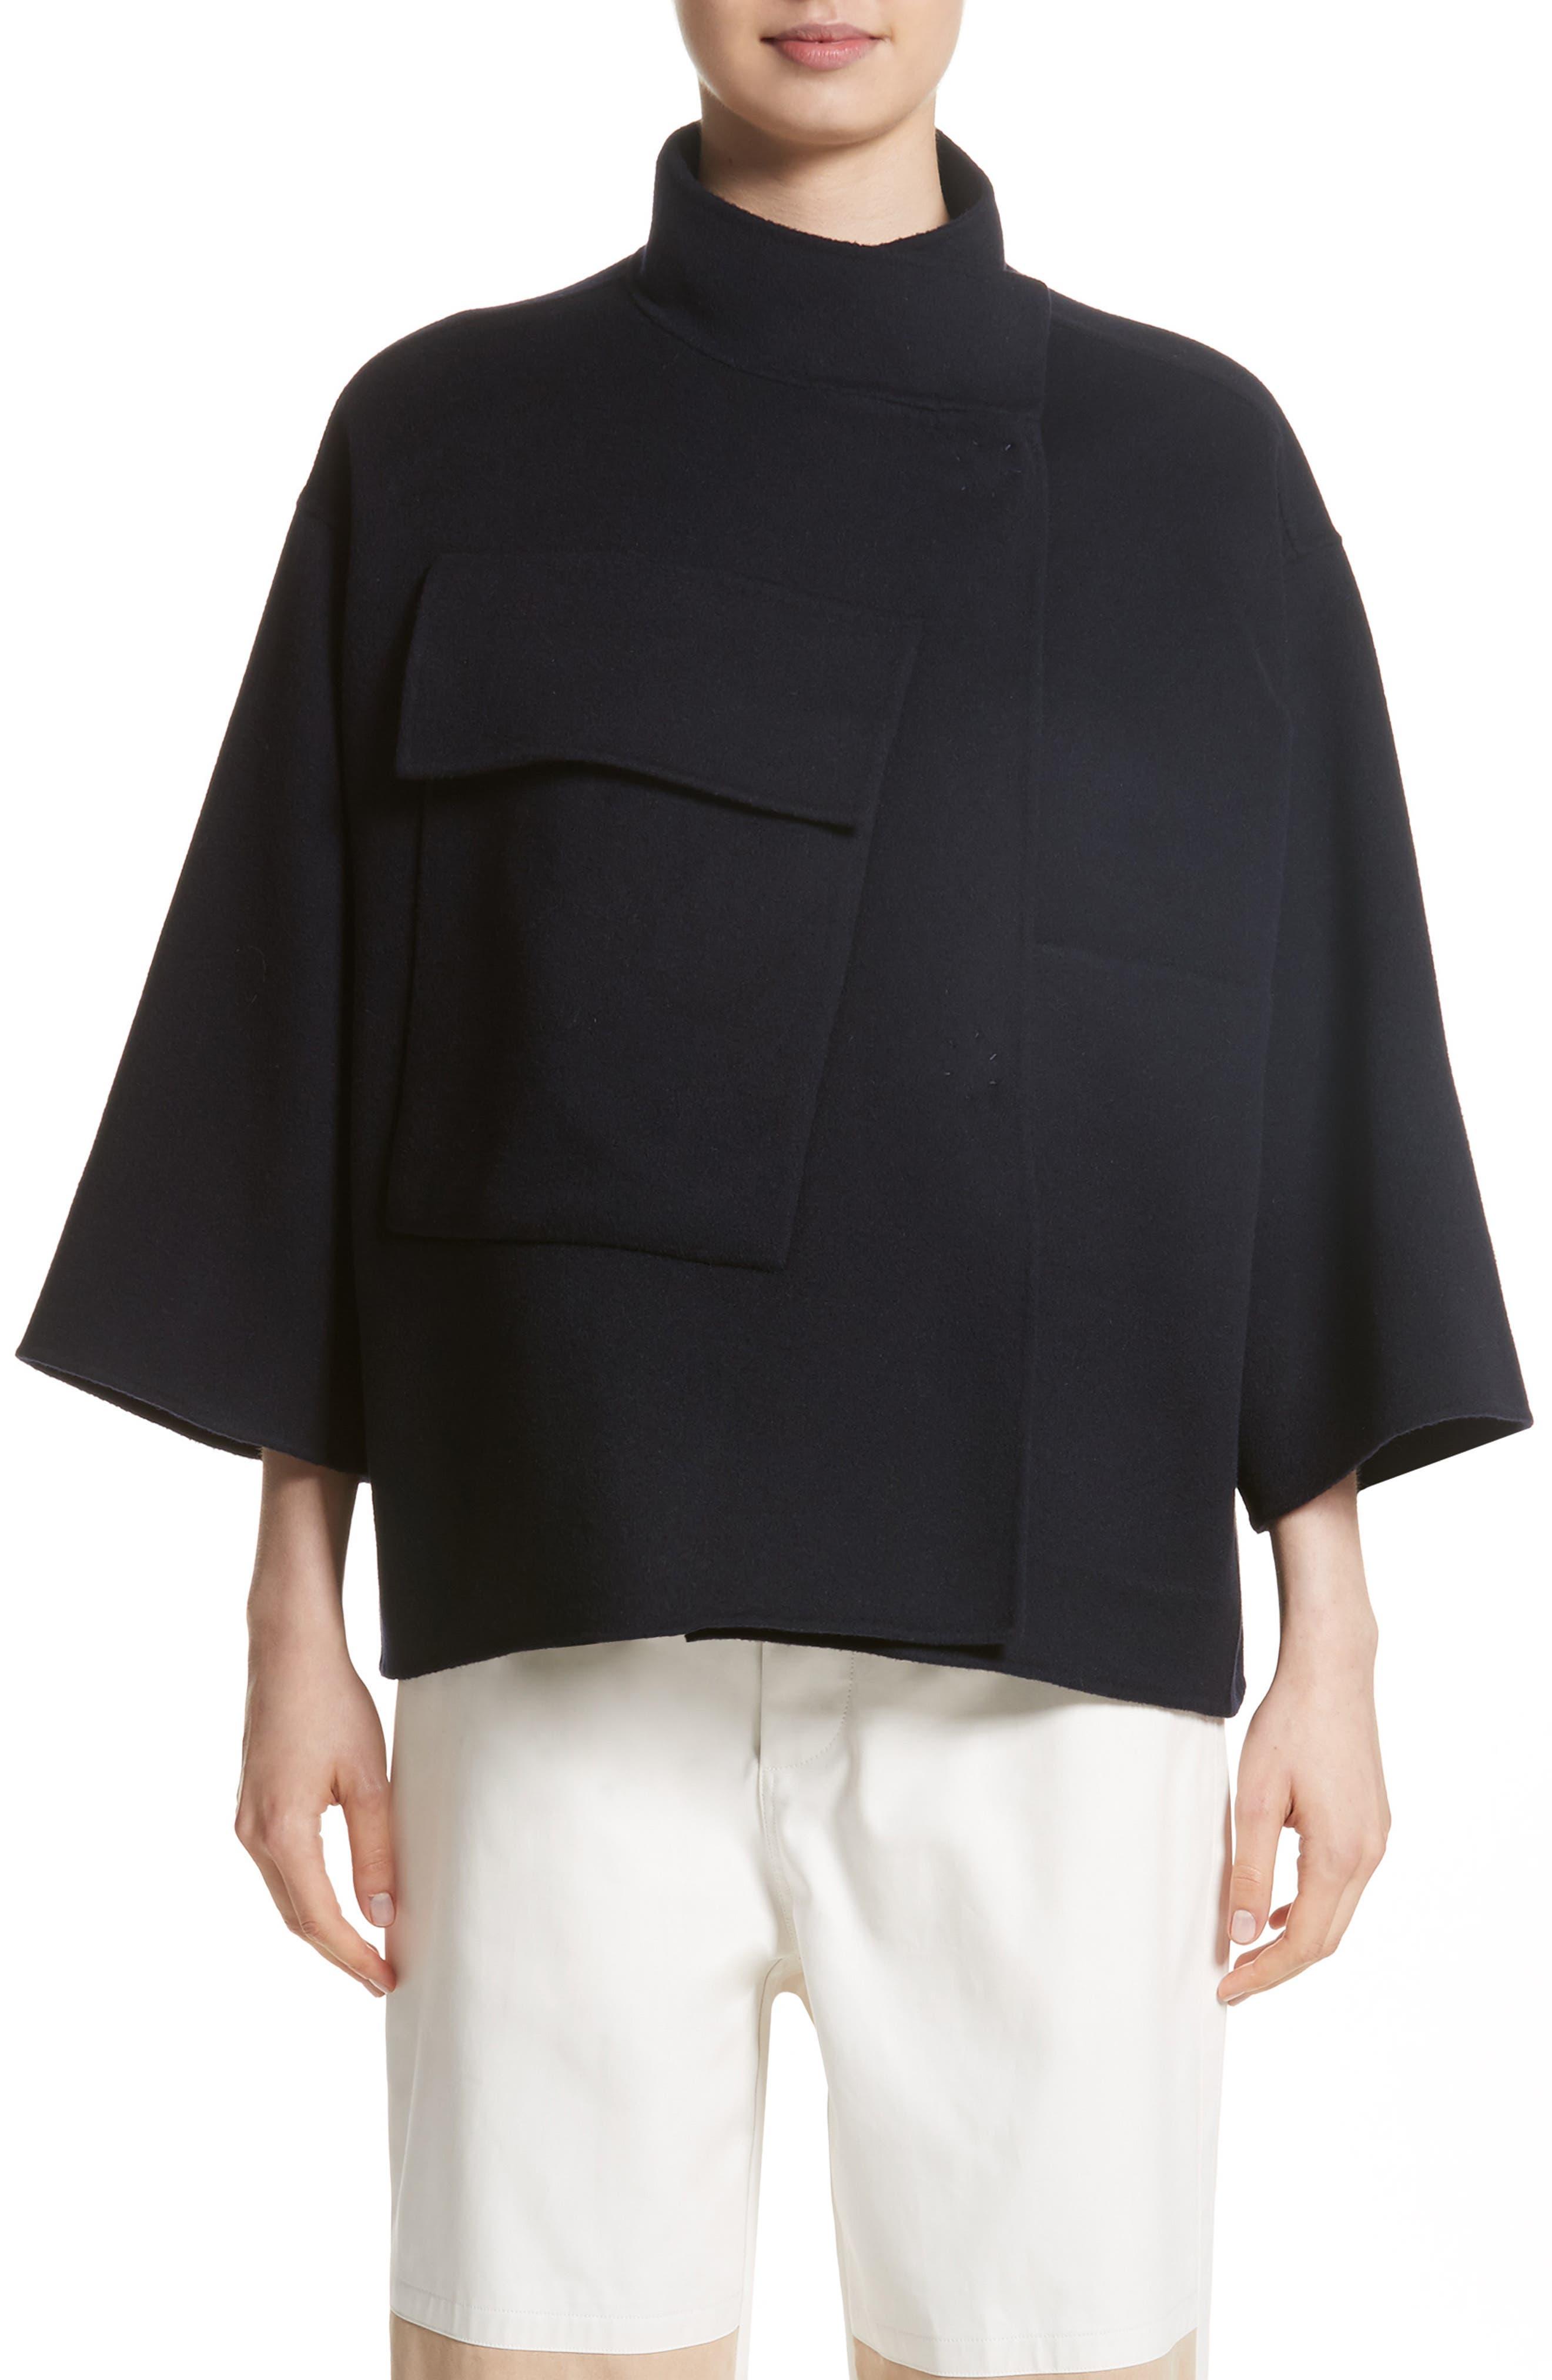 Alternate Image 1 Selected - Sofie D'Hoore Crop Wool & Cashmere Jacket